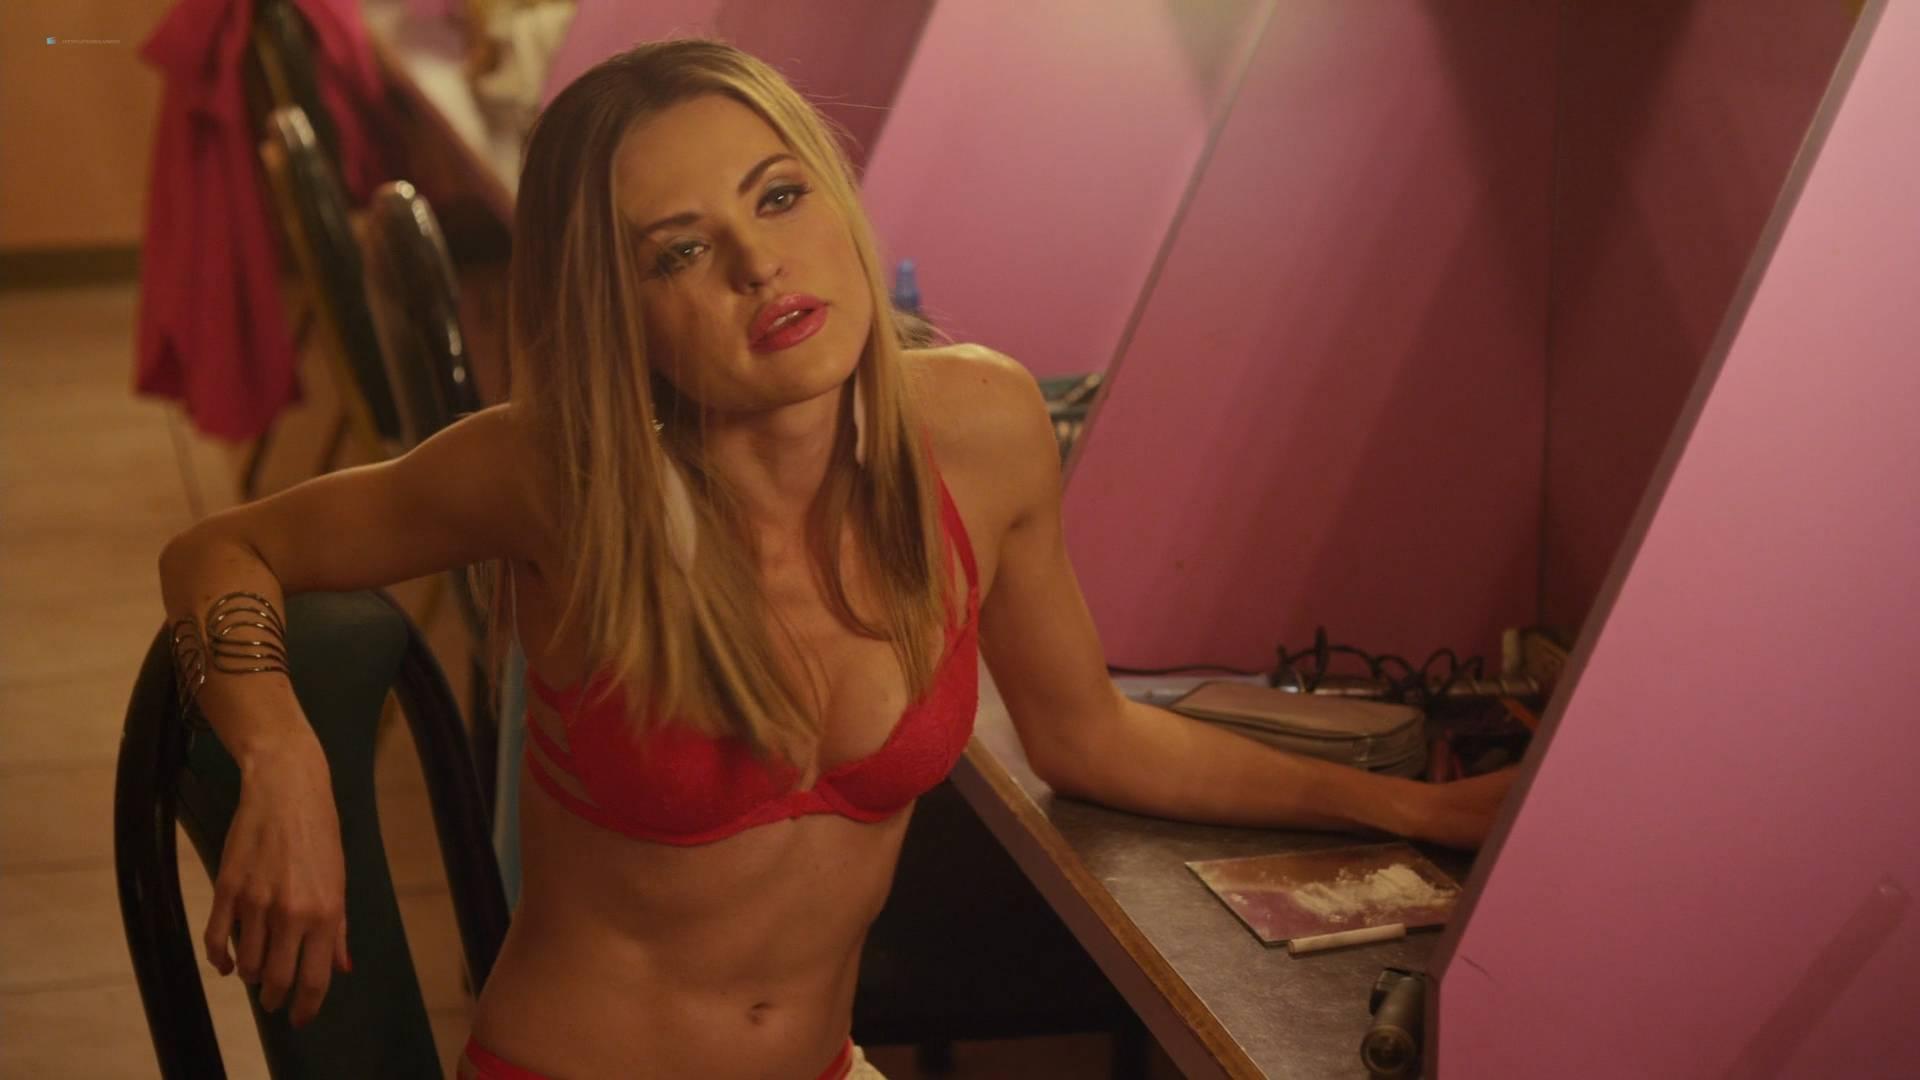 Helena Mattsson hot, Ileana Huxley and April Jorgensen nude topless - Code of Honor (2016) HD 1080p (8)